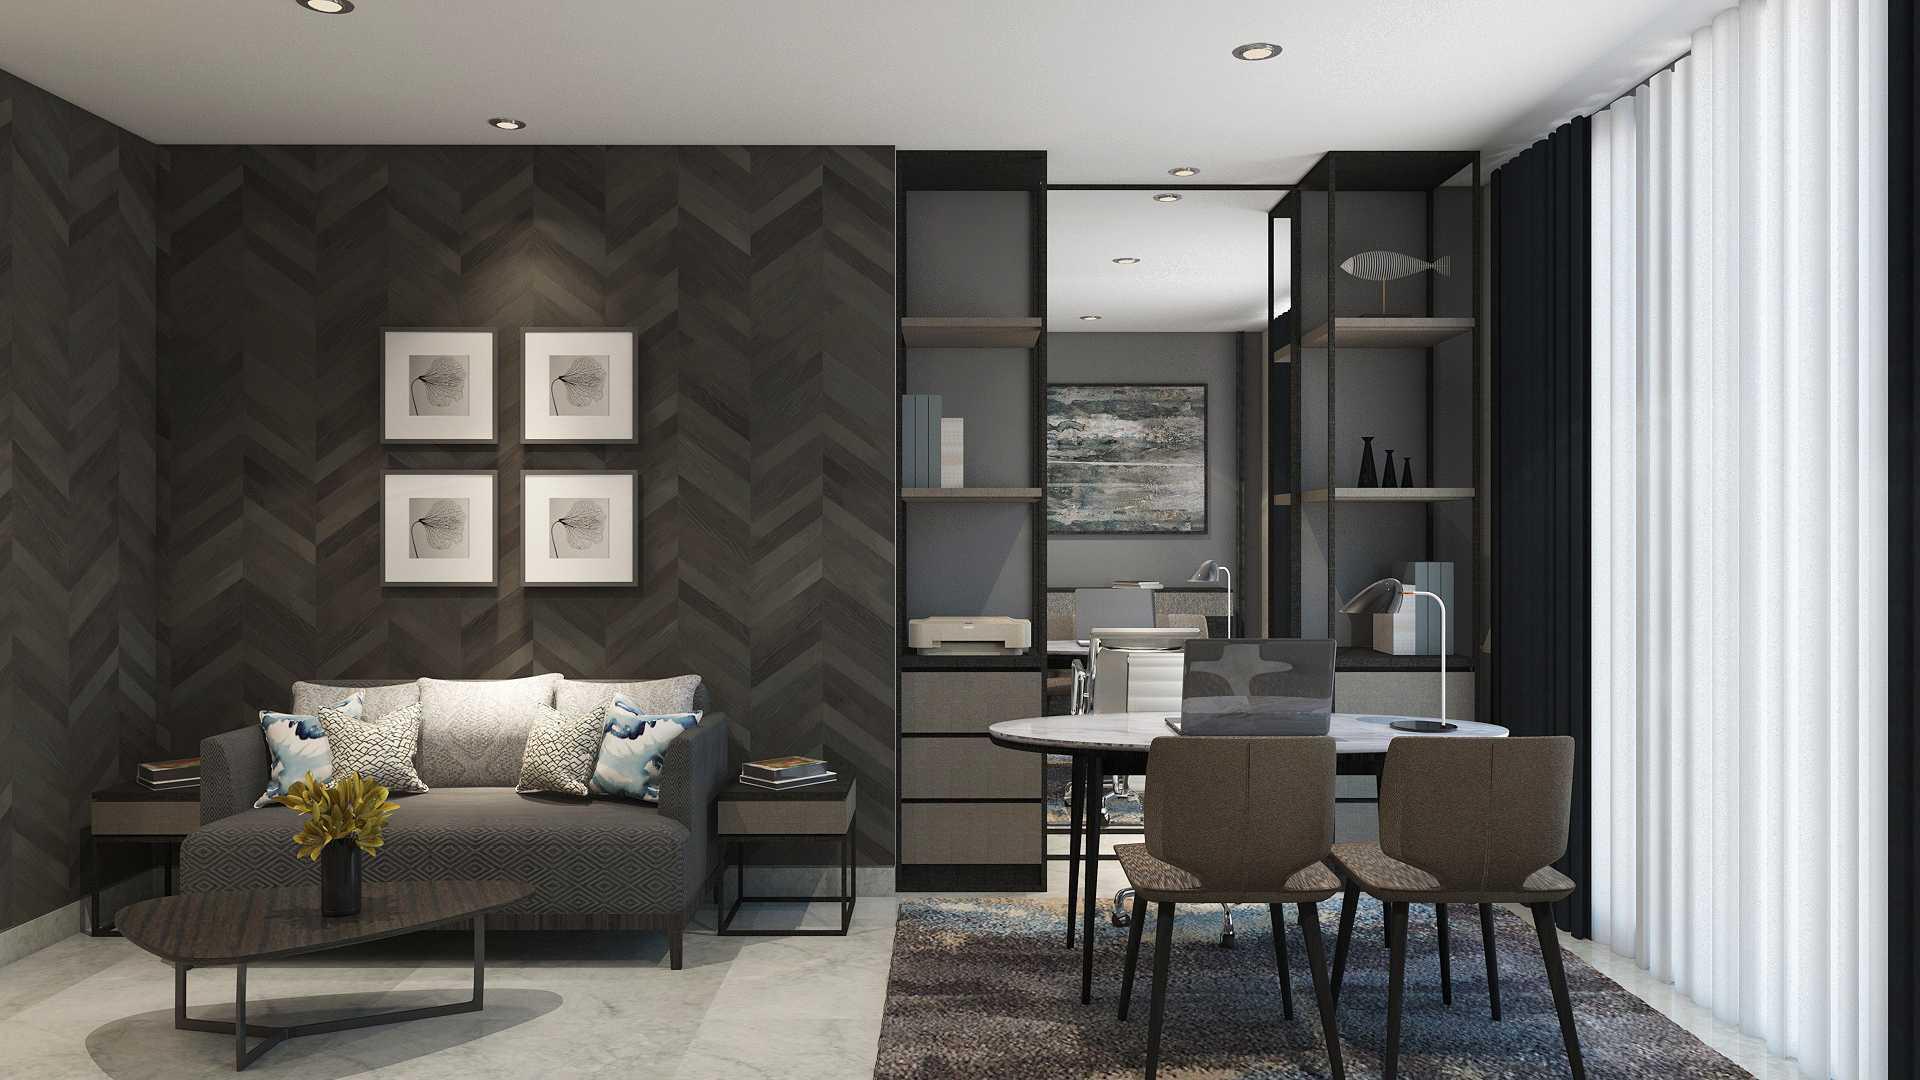 Oka Leonardy Interior Design Concept : Apartemen 2 Br - Jakarta Cikarang, Bekasi, Jawa Barat, Indonesia Cikarang, Bekasi, Jawa Barat, Indonesia Oka-Leonardy-Interior-Design-Concept-Apartemen-2-Br-Jakarta   110541